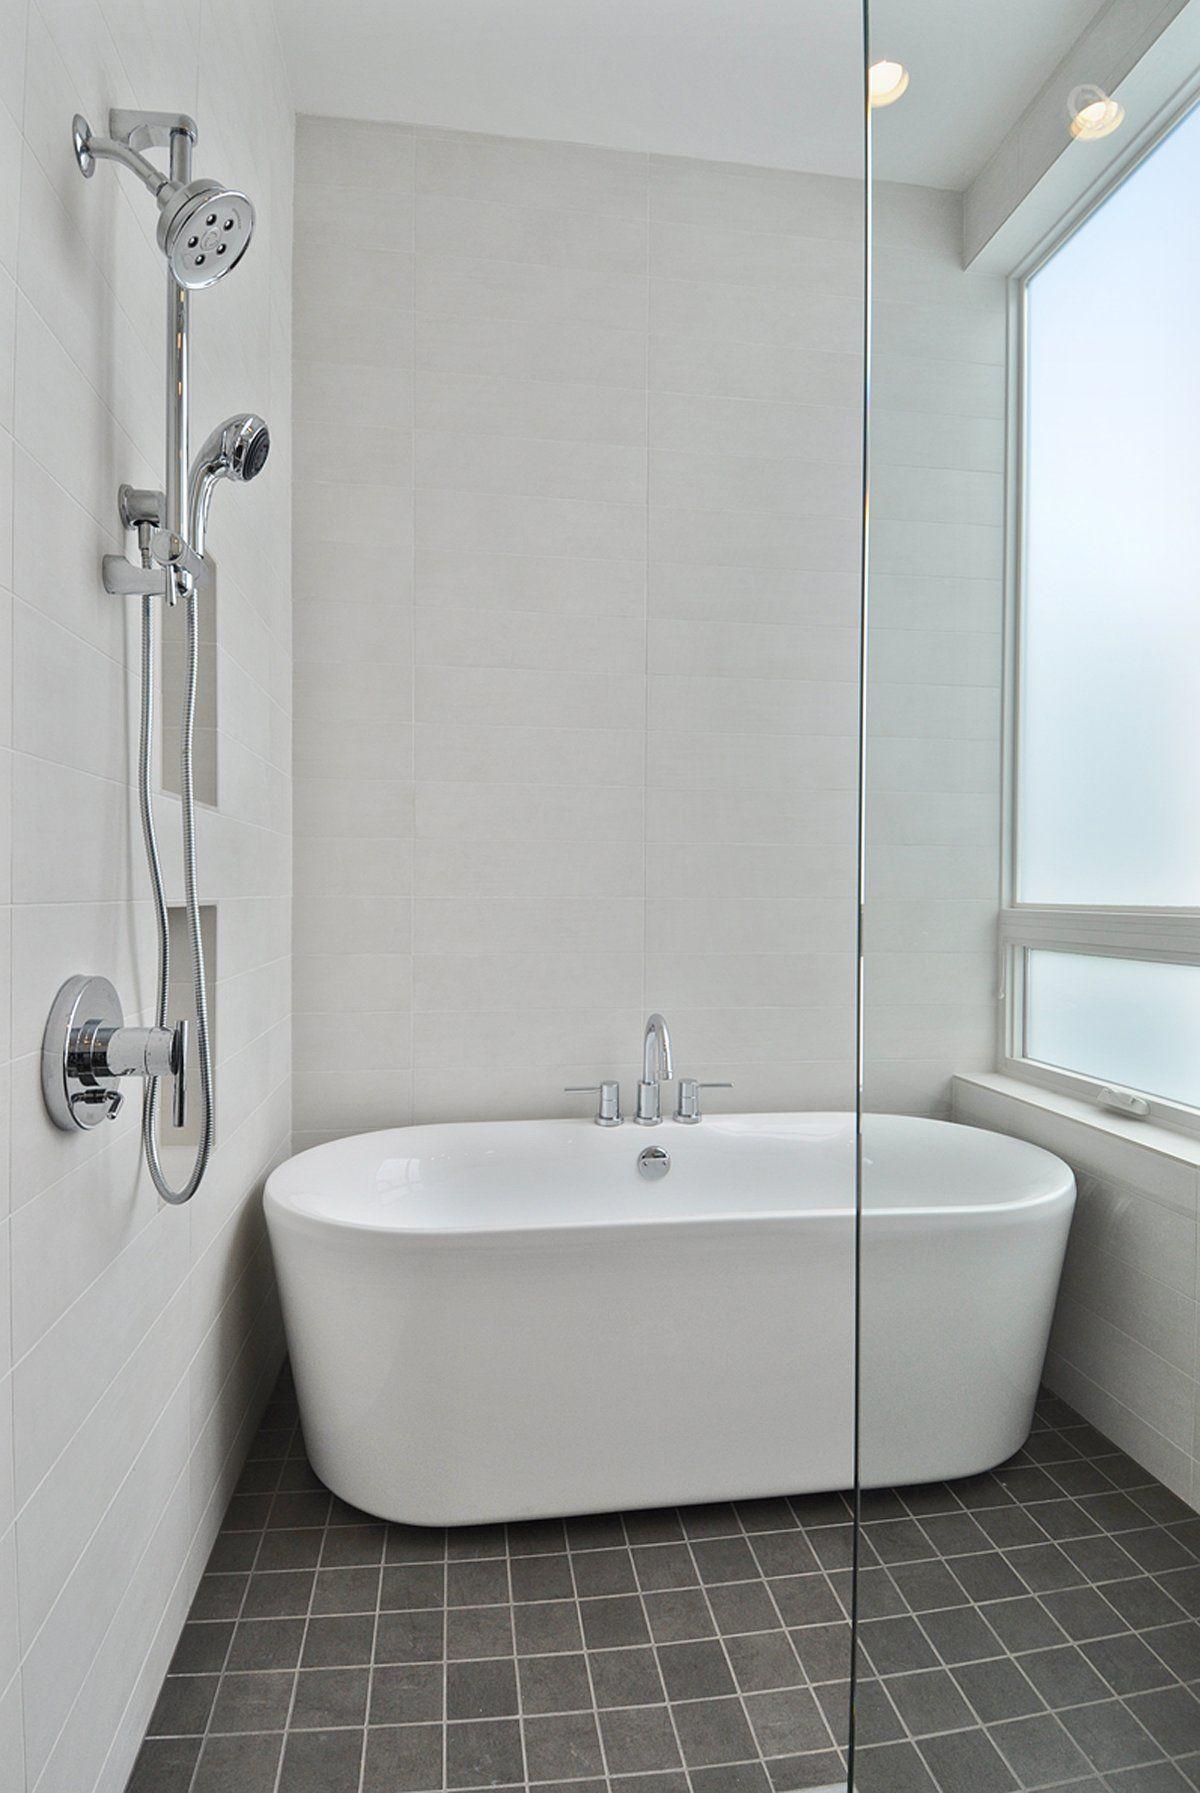 http://walkinshowers.org/best-bathroom-exhaust-fan-reviews.html ...